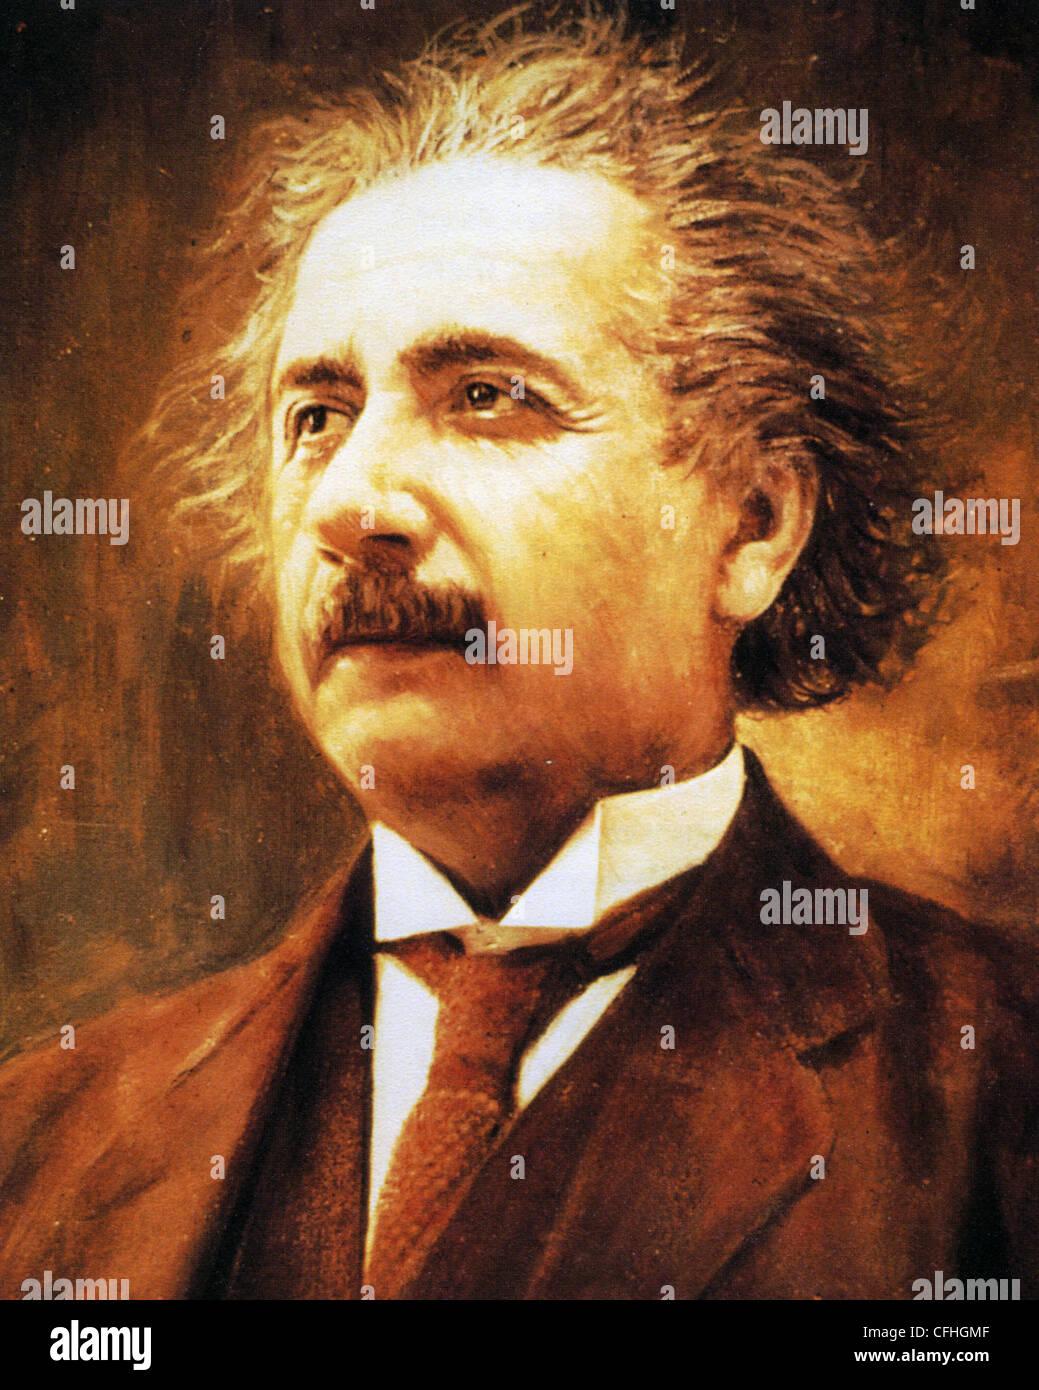 ALBERT Einstein (1879-1955) nasceu físico teórico AlemãoFoto de Stock